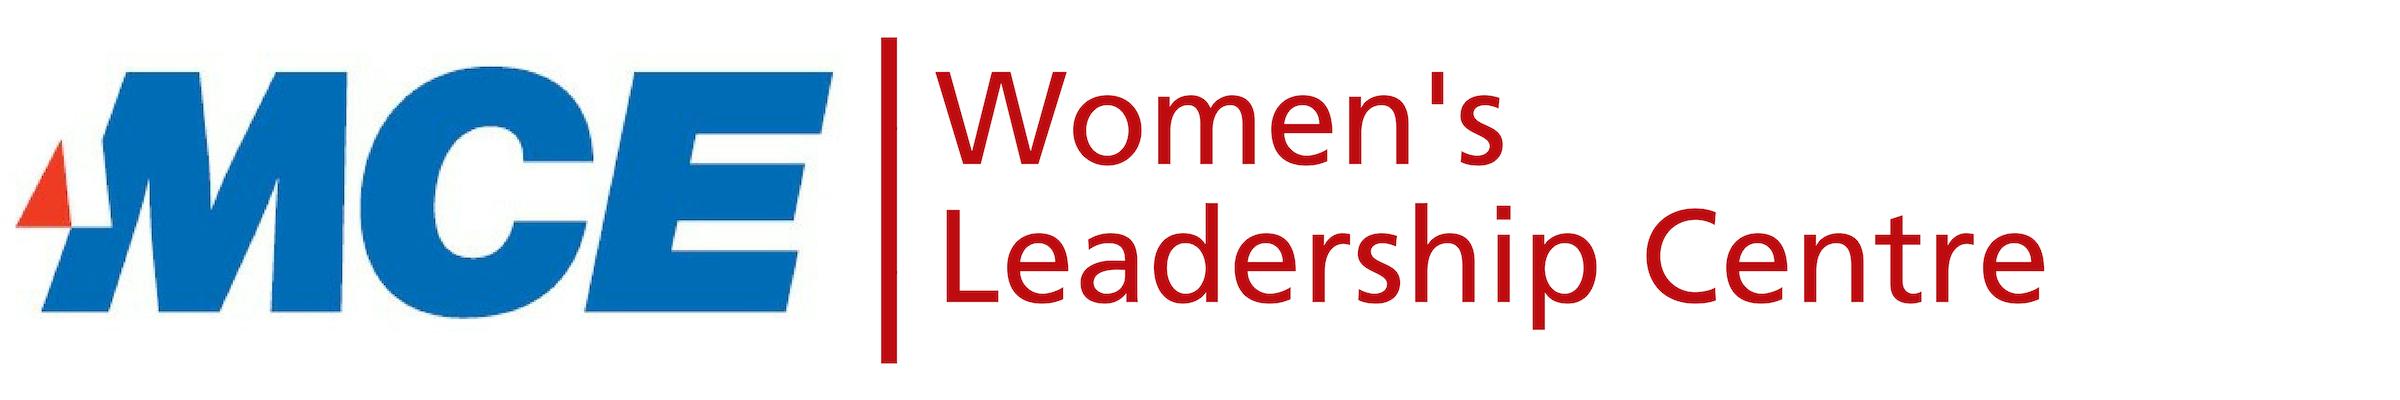 MCE Women's Leadership Centre